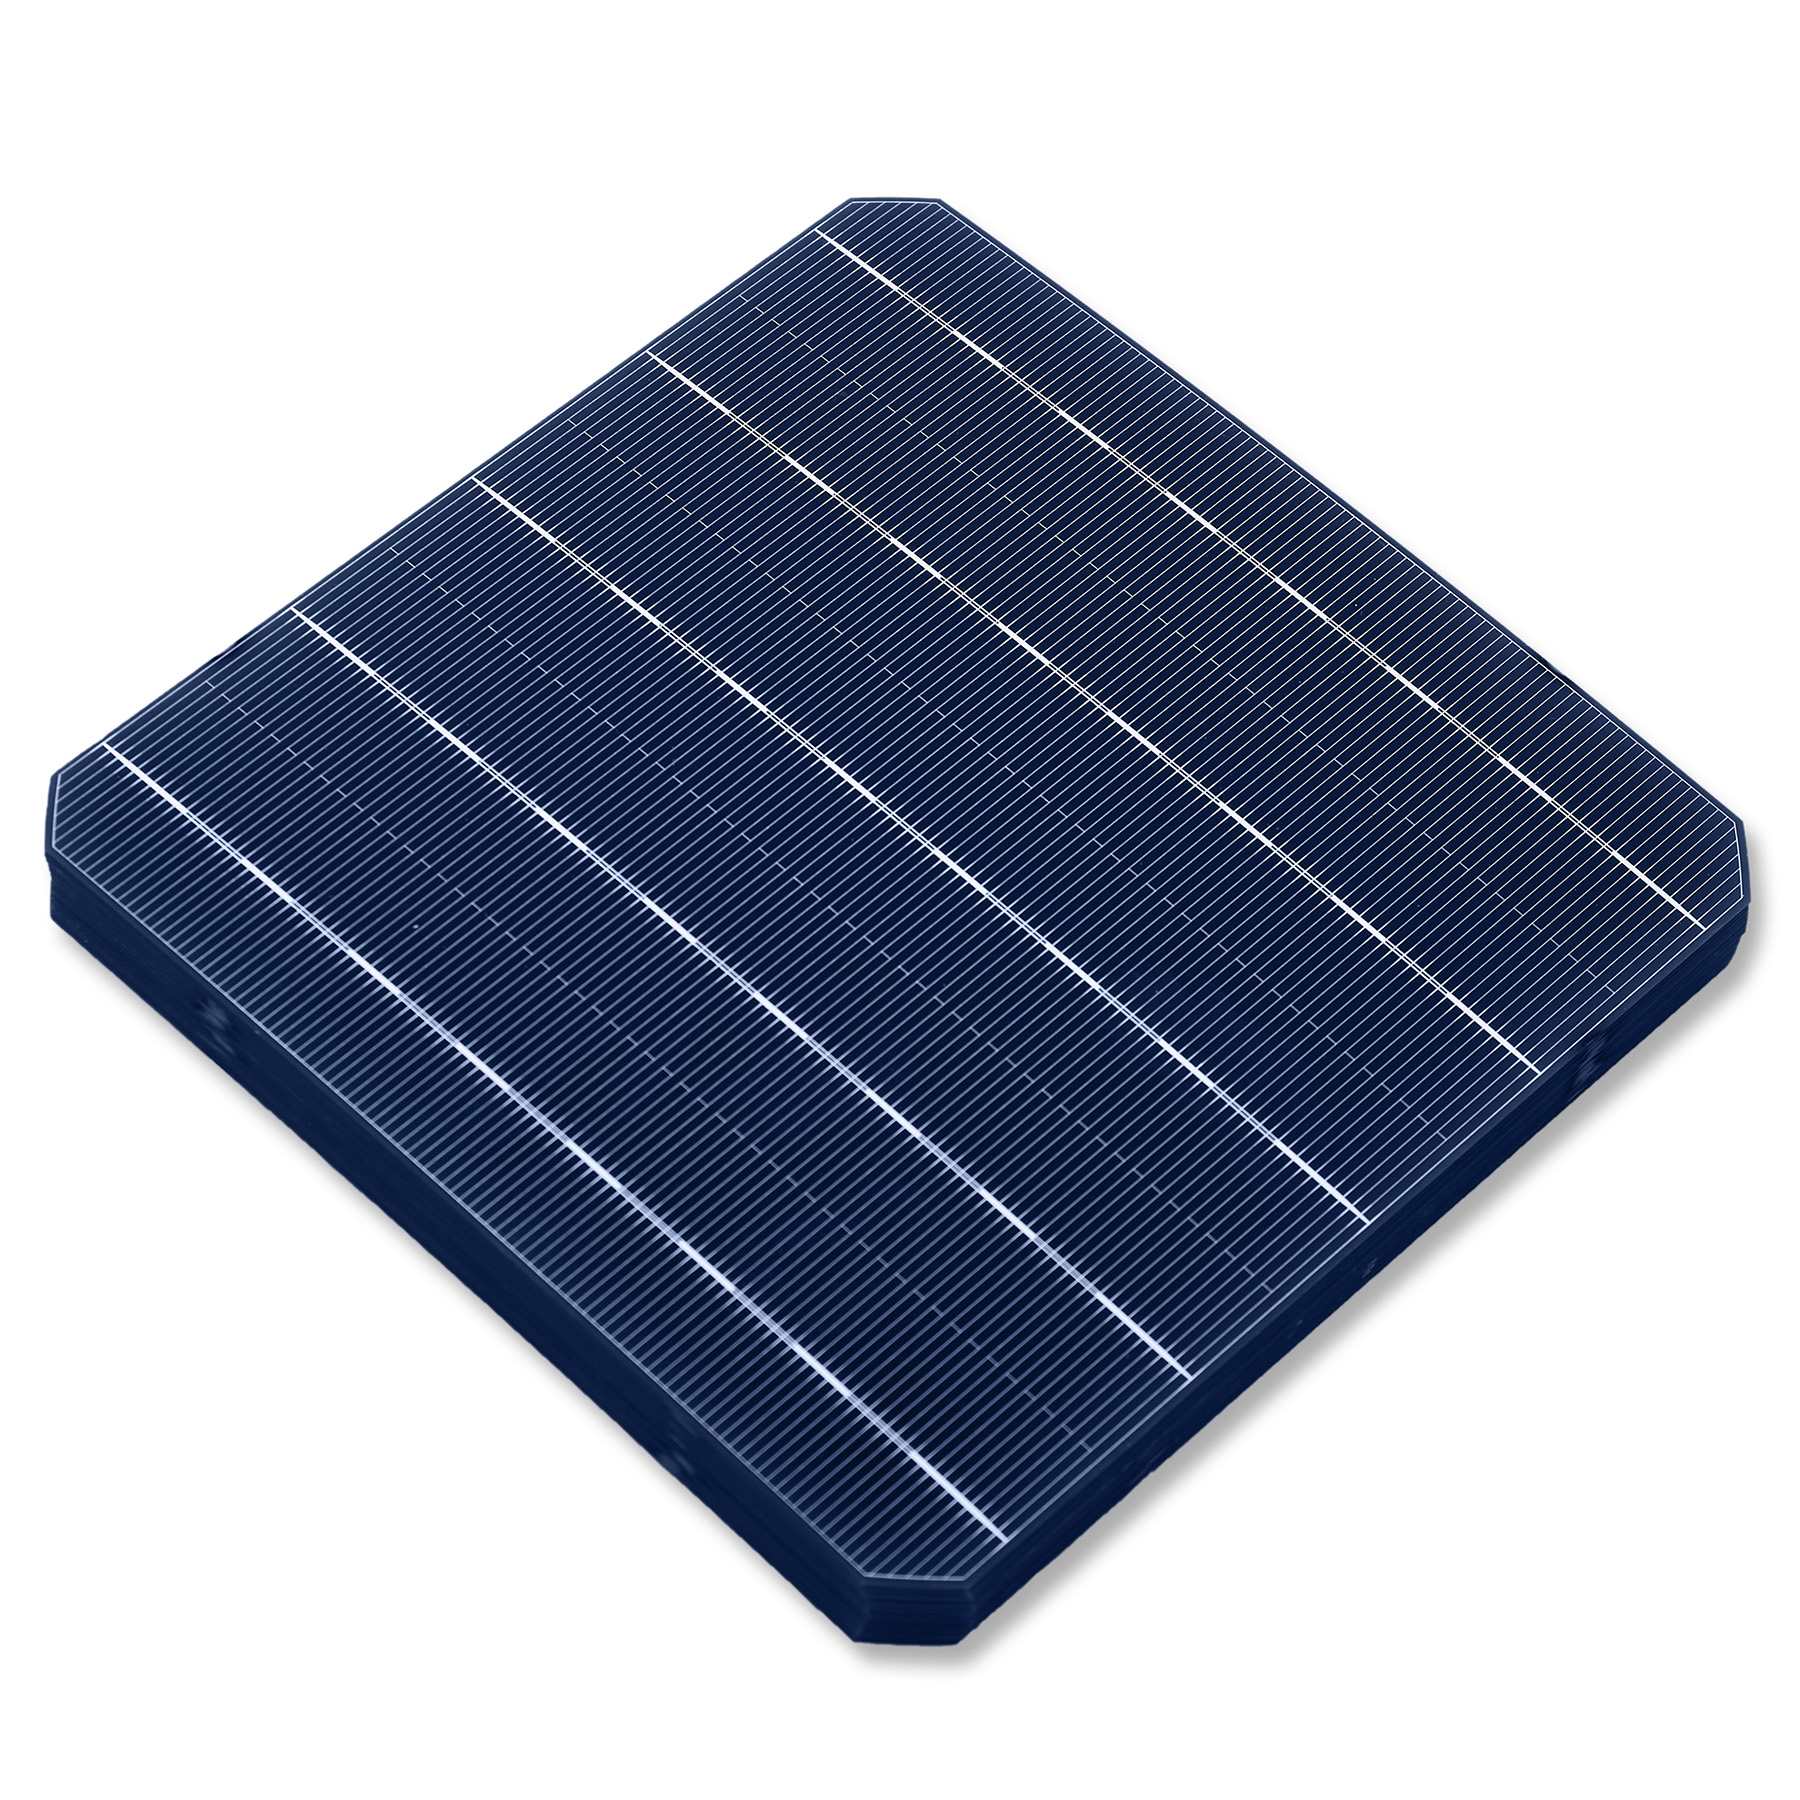 40Pcs 5W/Pcs Monocrystalline Solar Cell 156 * 156mm For DIY Photovoltaic Mono Solar Panel